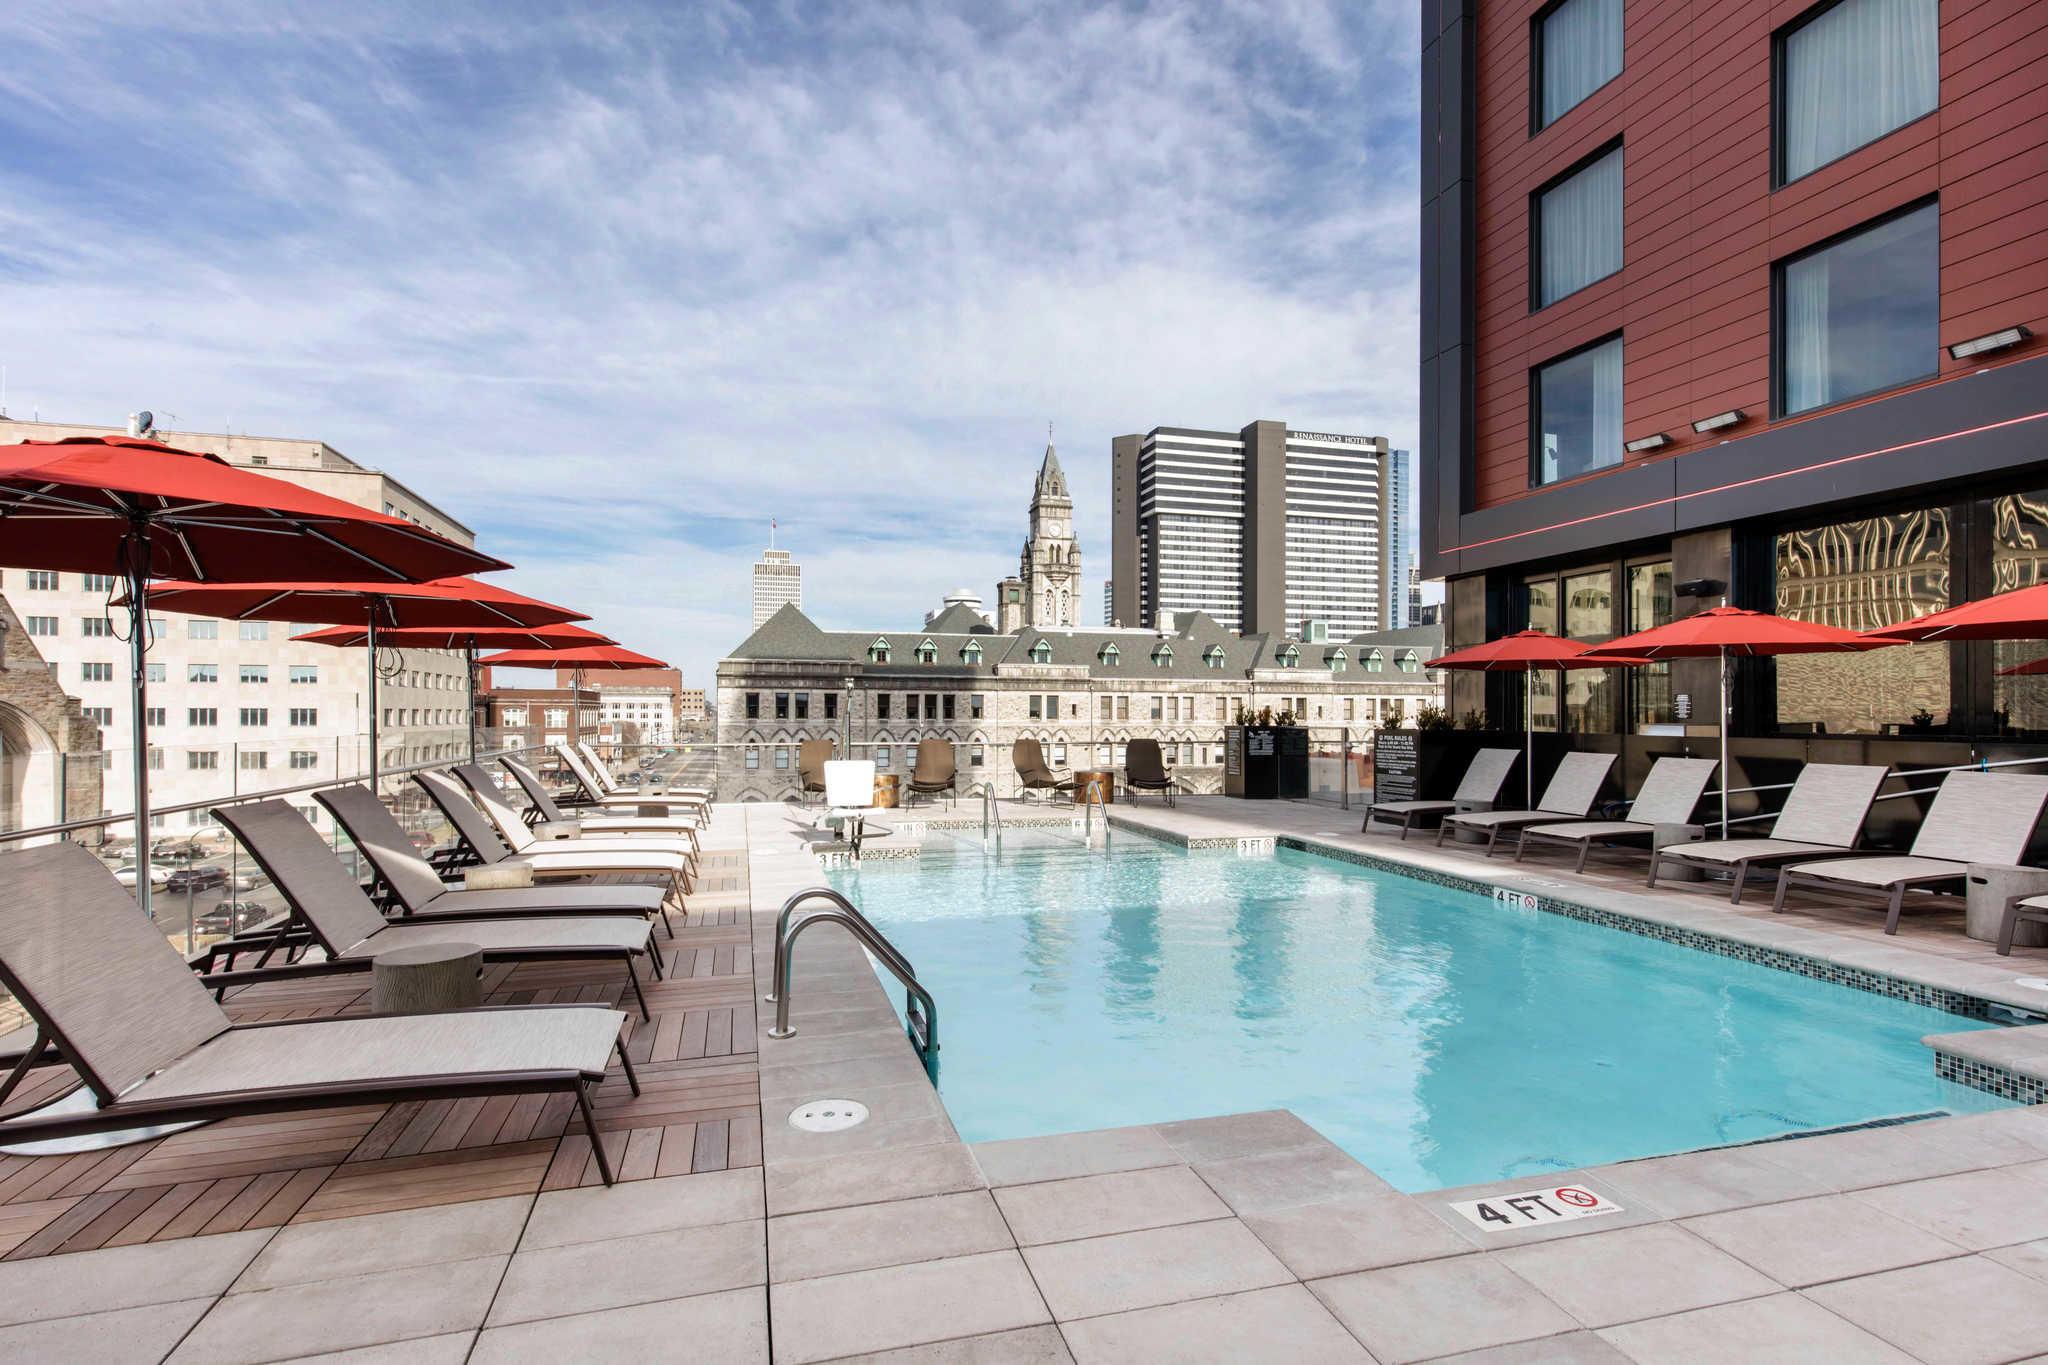 Hotel Suites Nashville Tn 2 Bedroomhtm